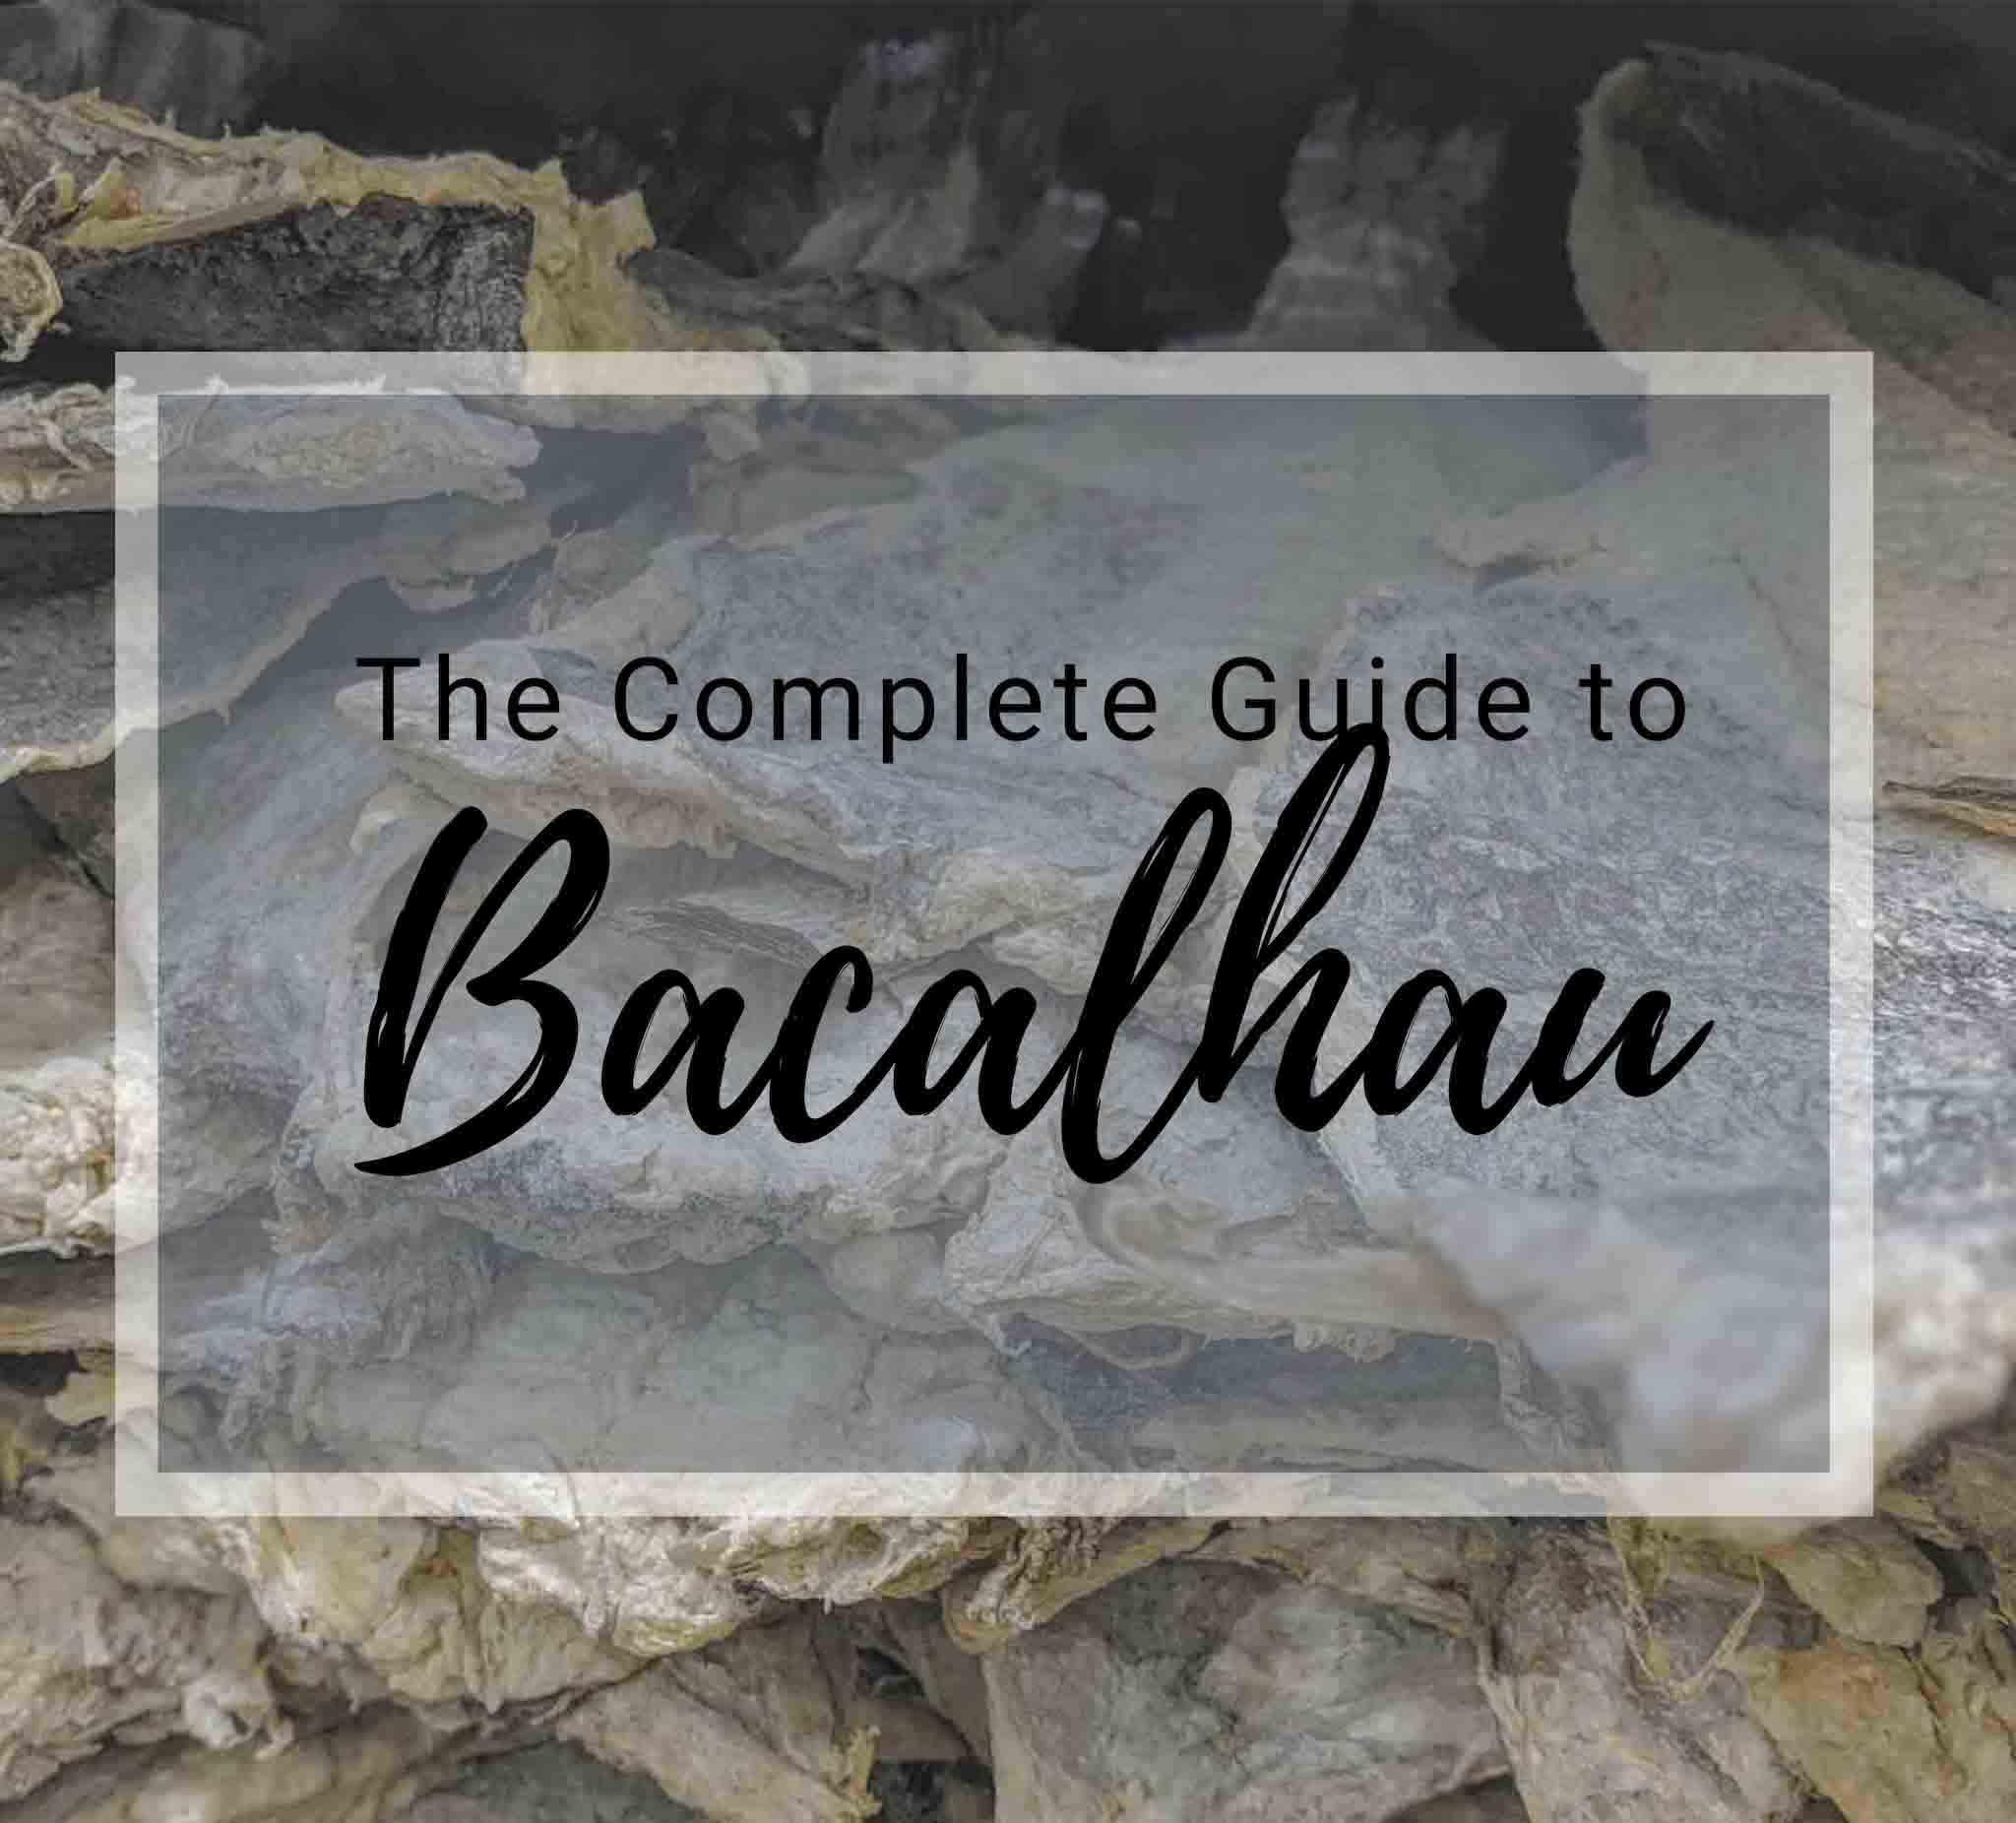 Bacalhau cover image